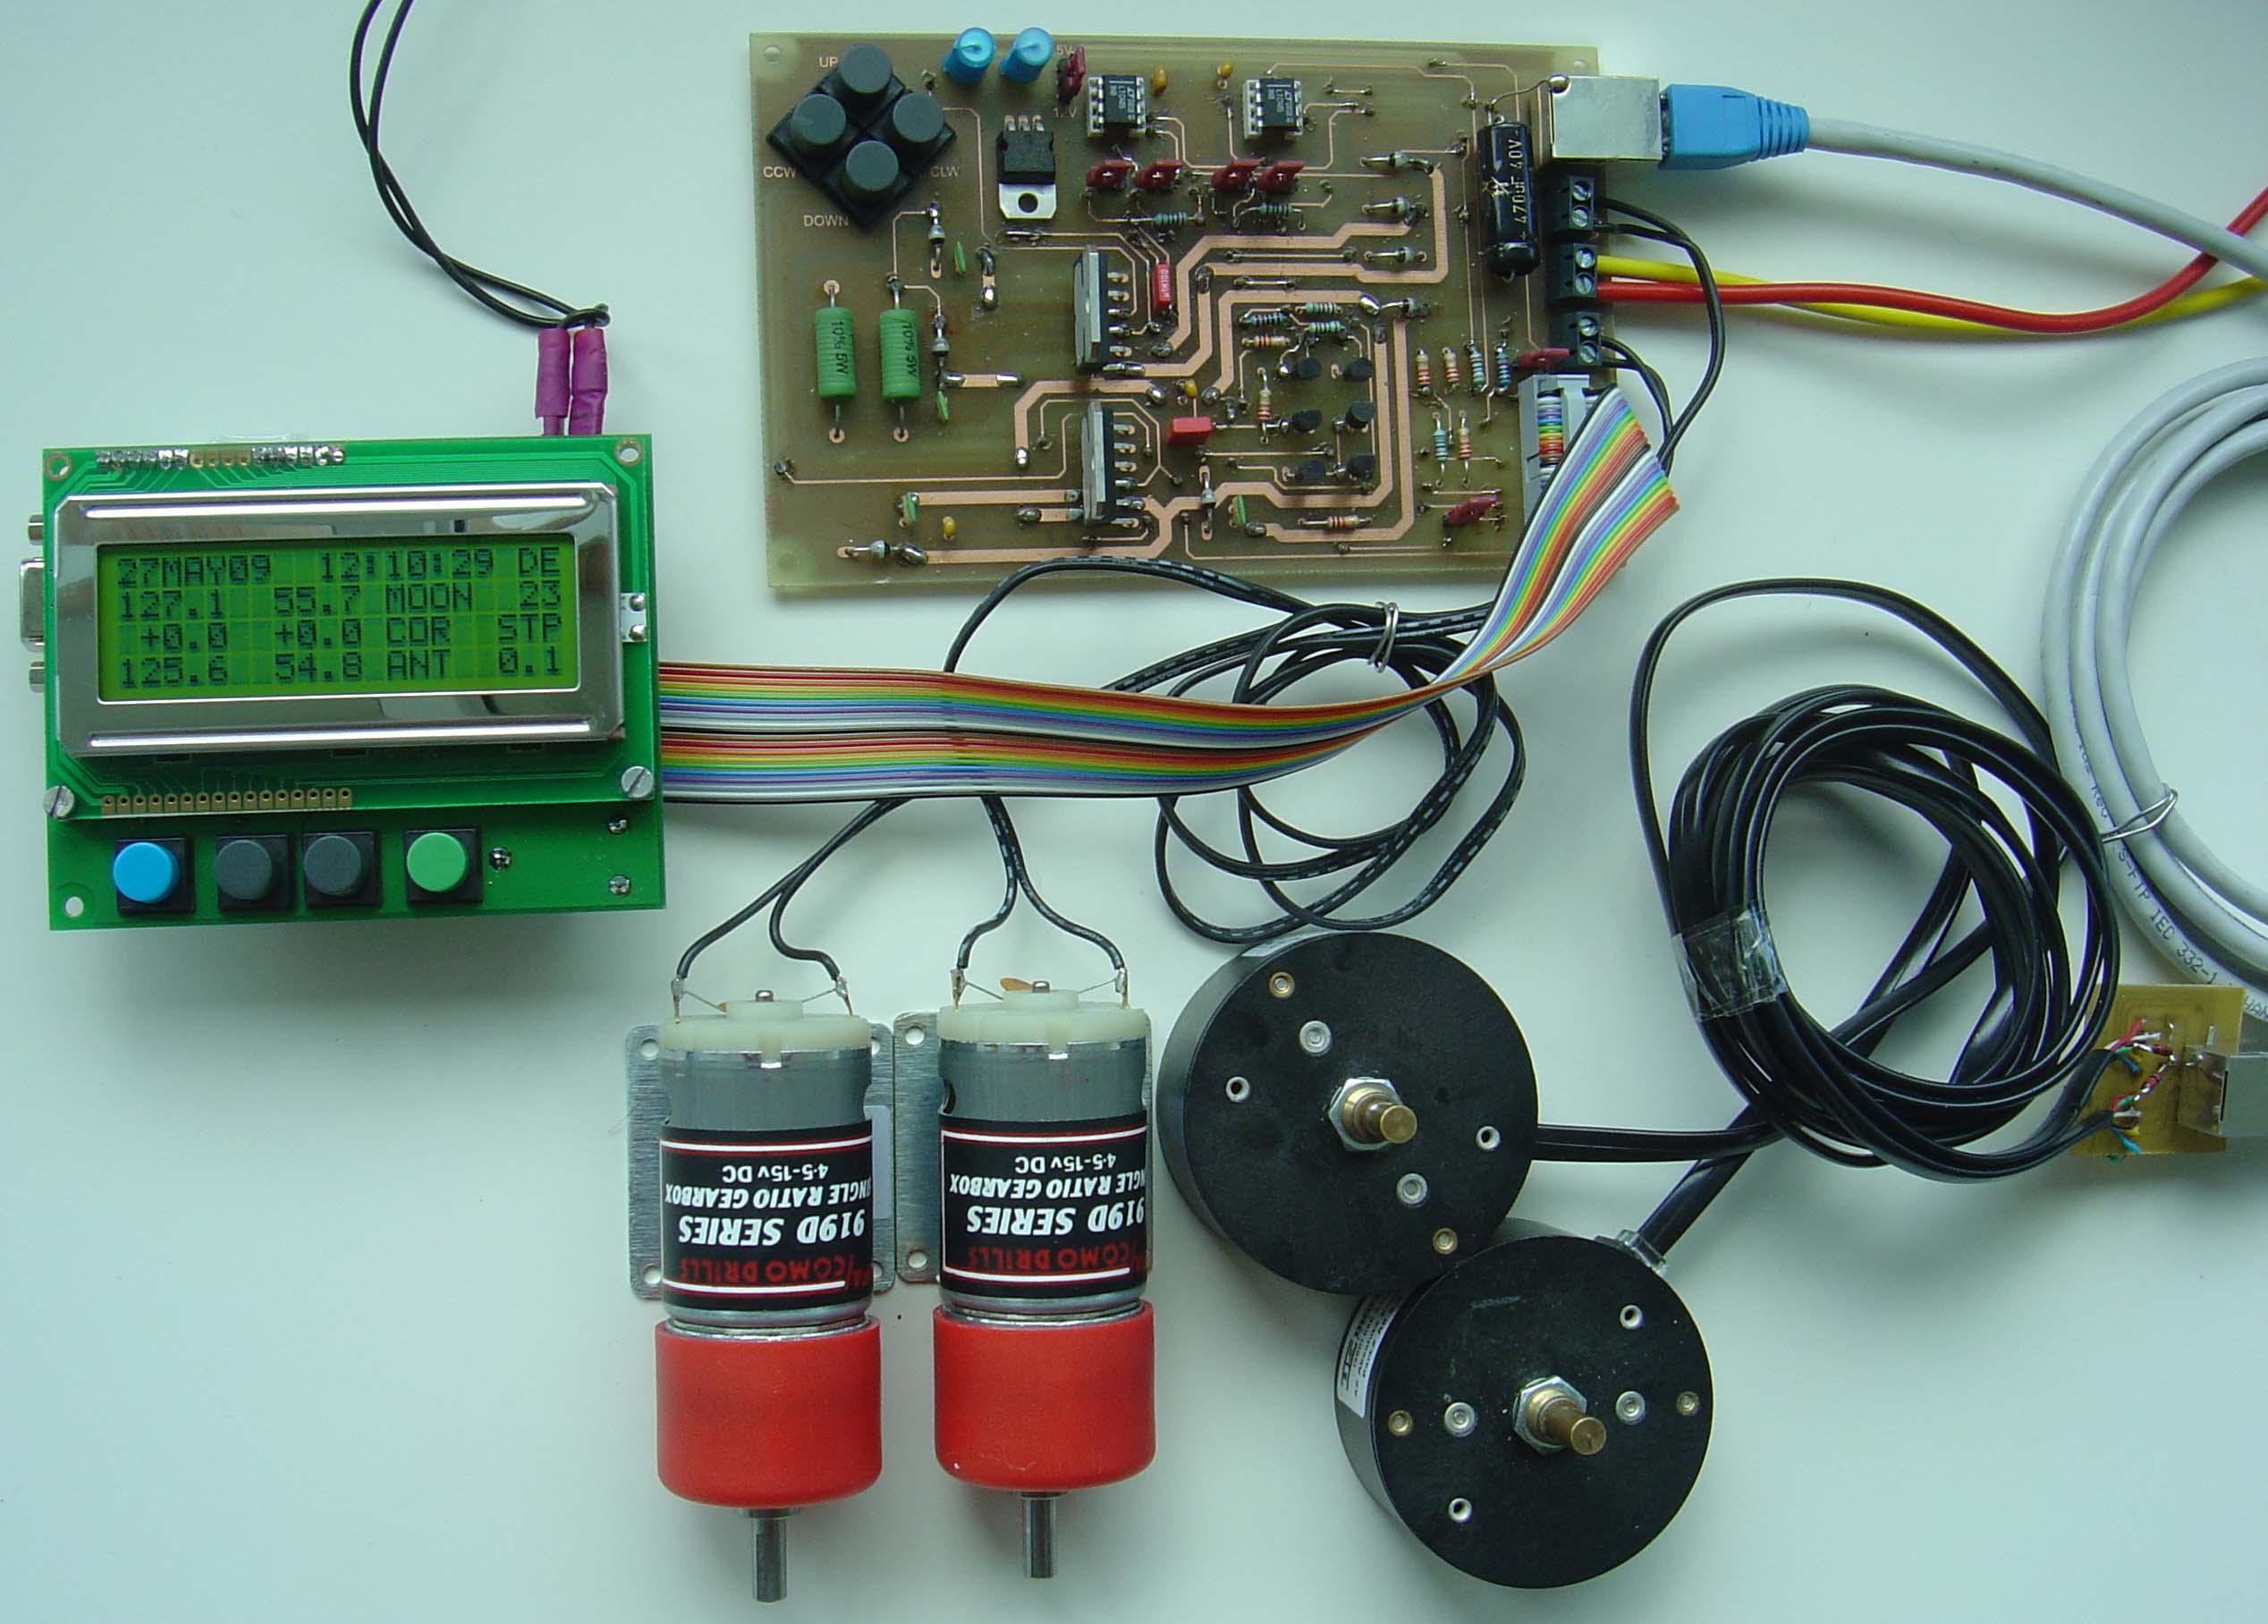 oe5jfl antenna control system